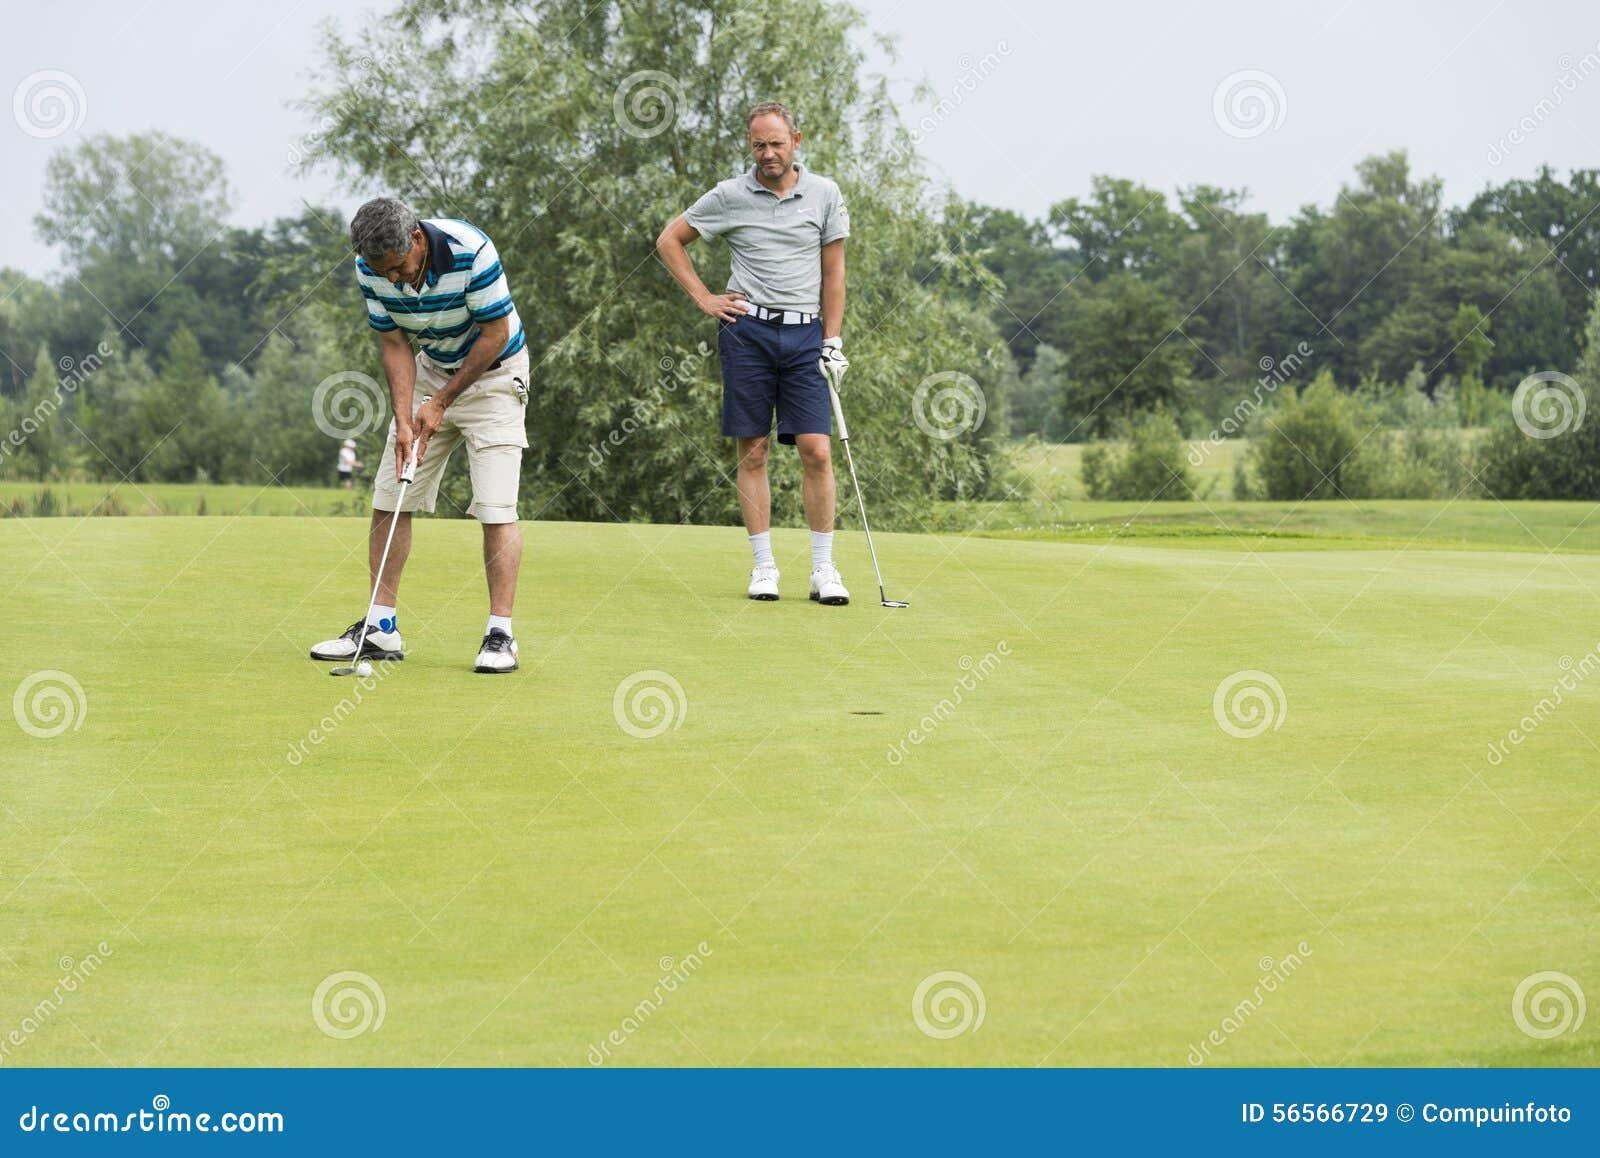 Download Οι παίκτες γκολφ παίζουν τη σφαίρα στο πράσινο Εκδοτική Στοκ Εικόνα - εικόνα από αρσενικό, εκδοτικός: 56566729